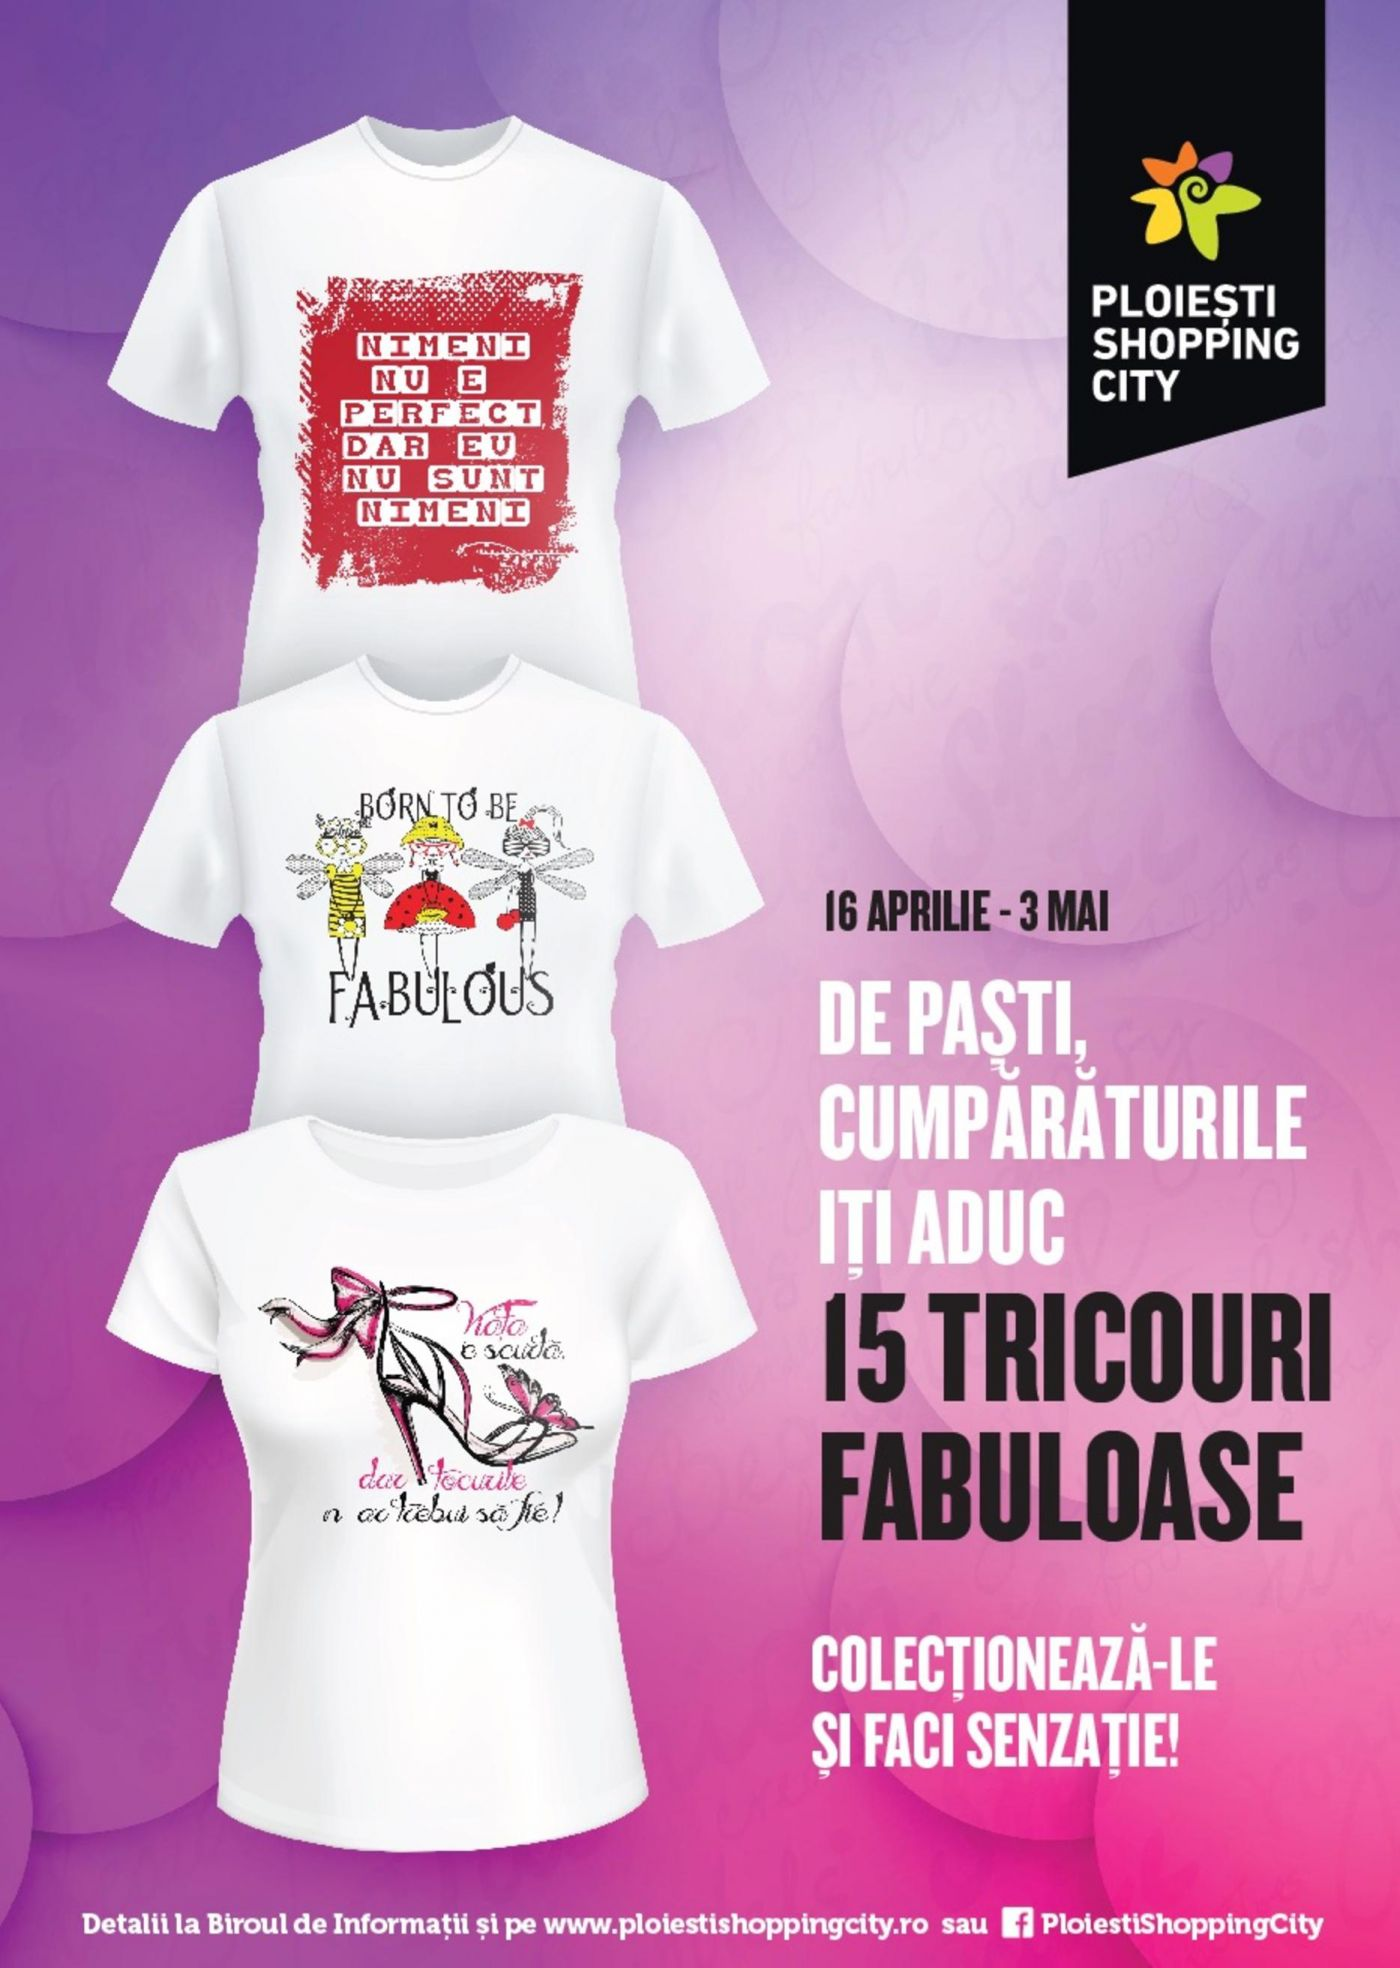 Colectie limitata de tricouri cu mesaje la Ploiesti Shopping City